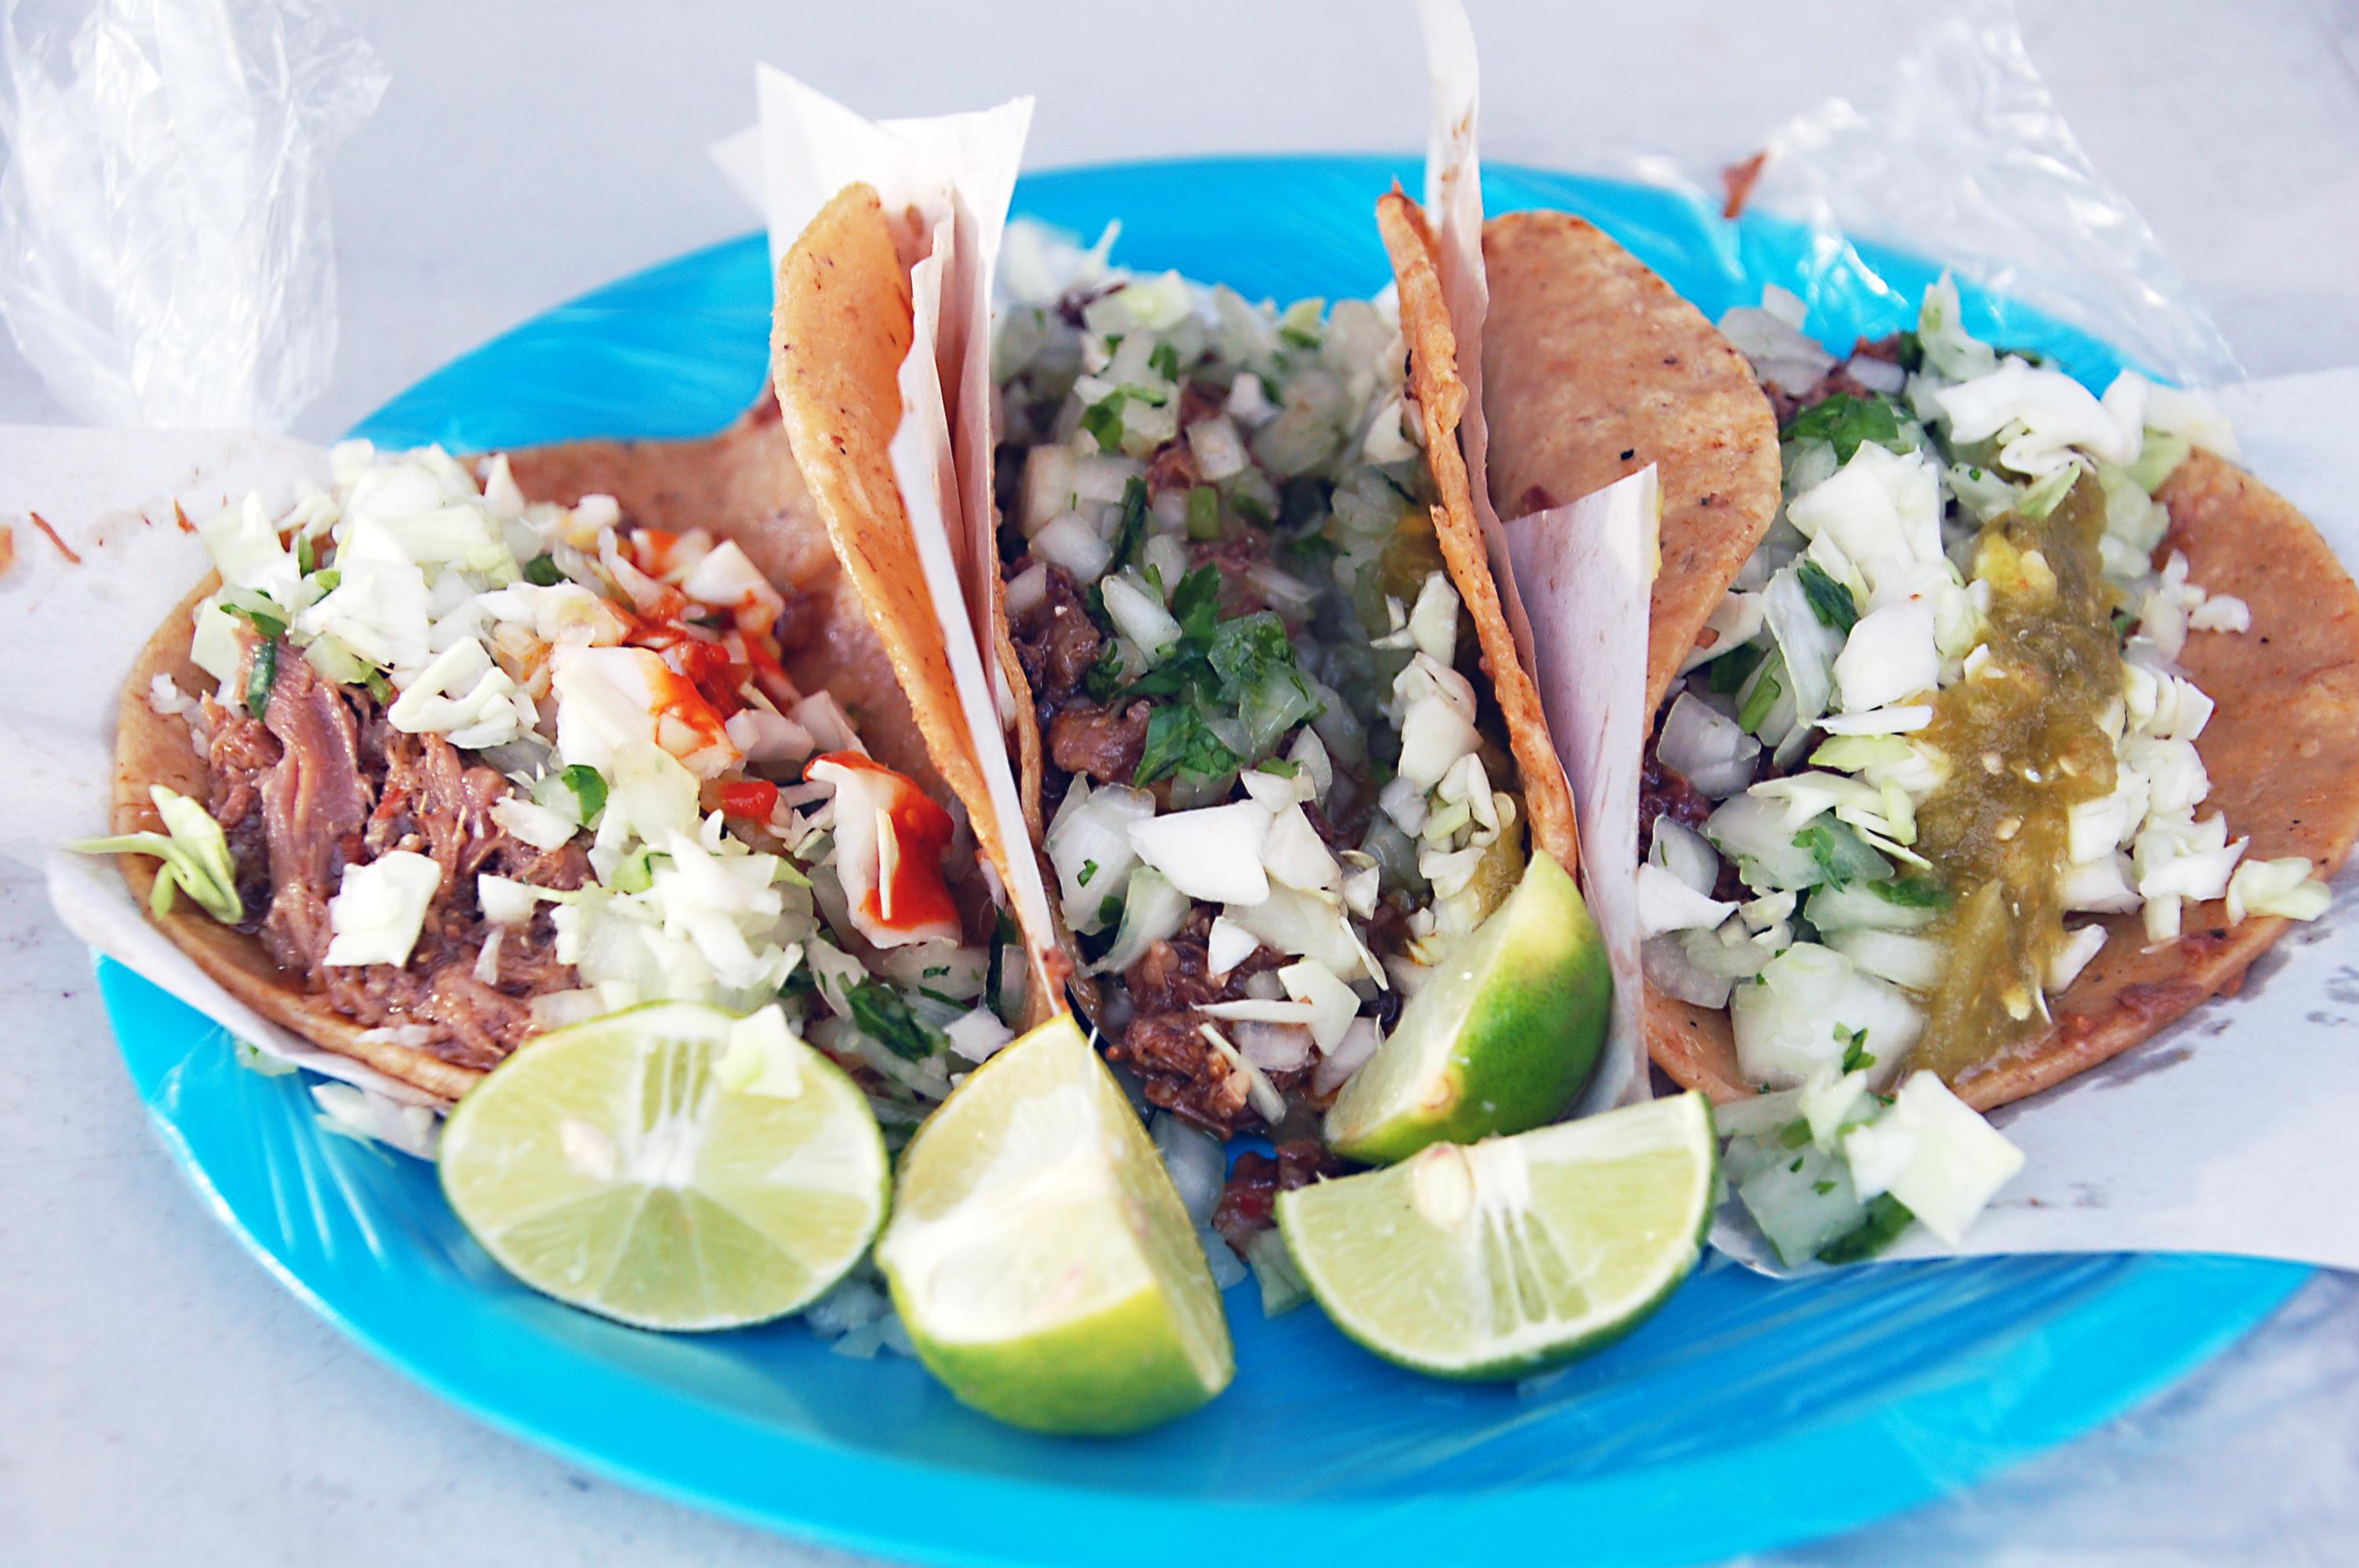 Tacos de borrego at El Cesarin, Mexicali, Baja California, Mexico